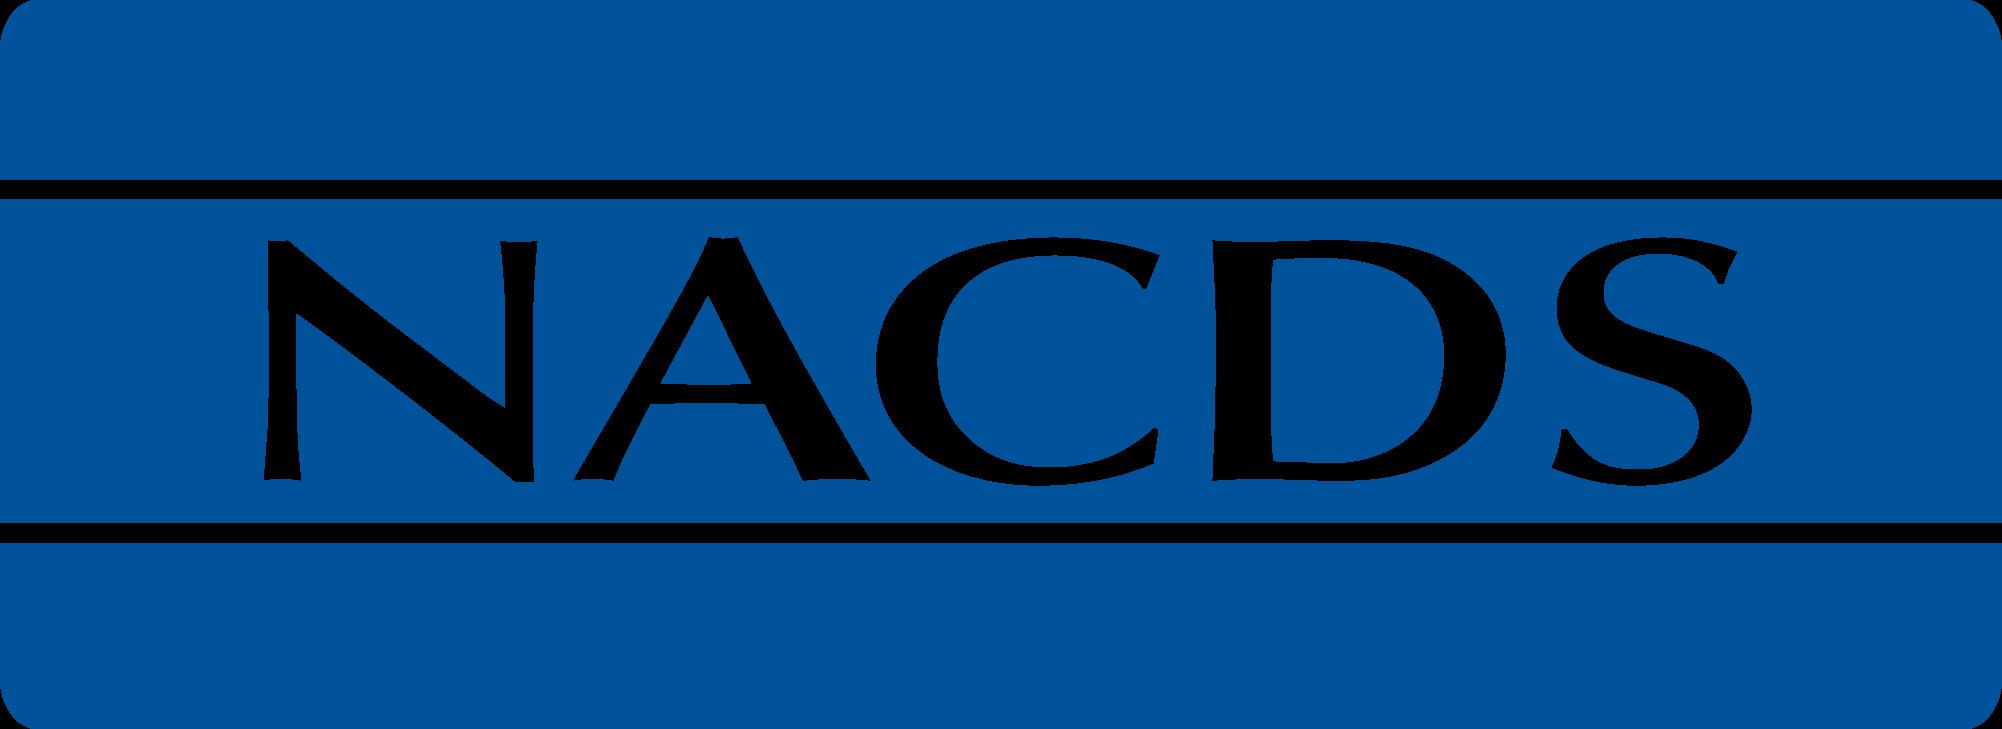 NACDS Logo_Retina_Blue.png